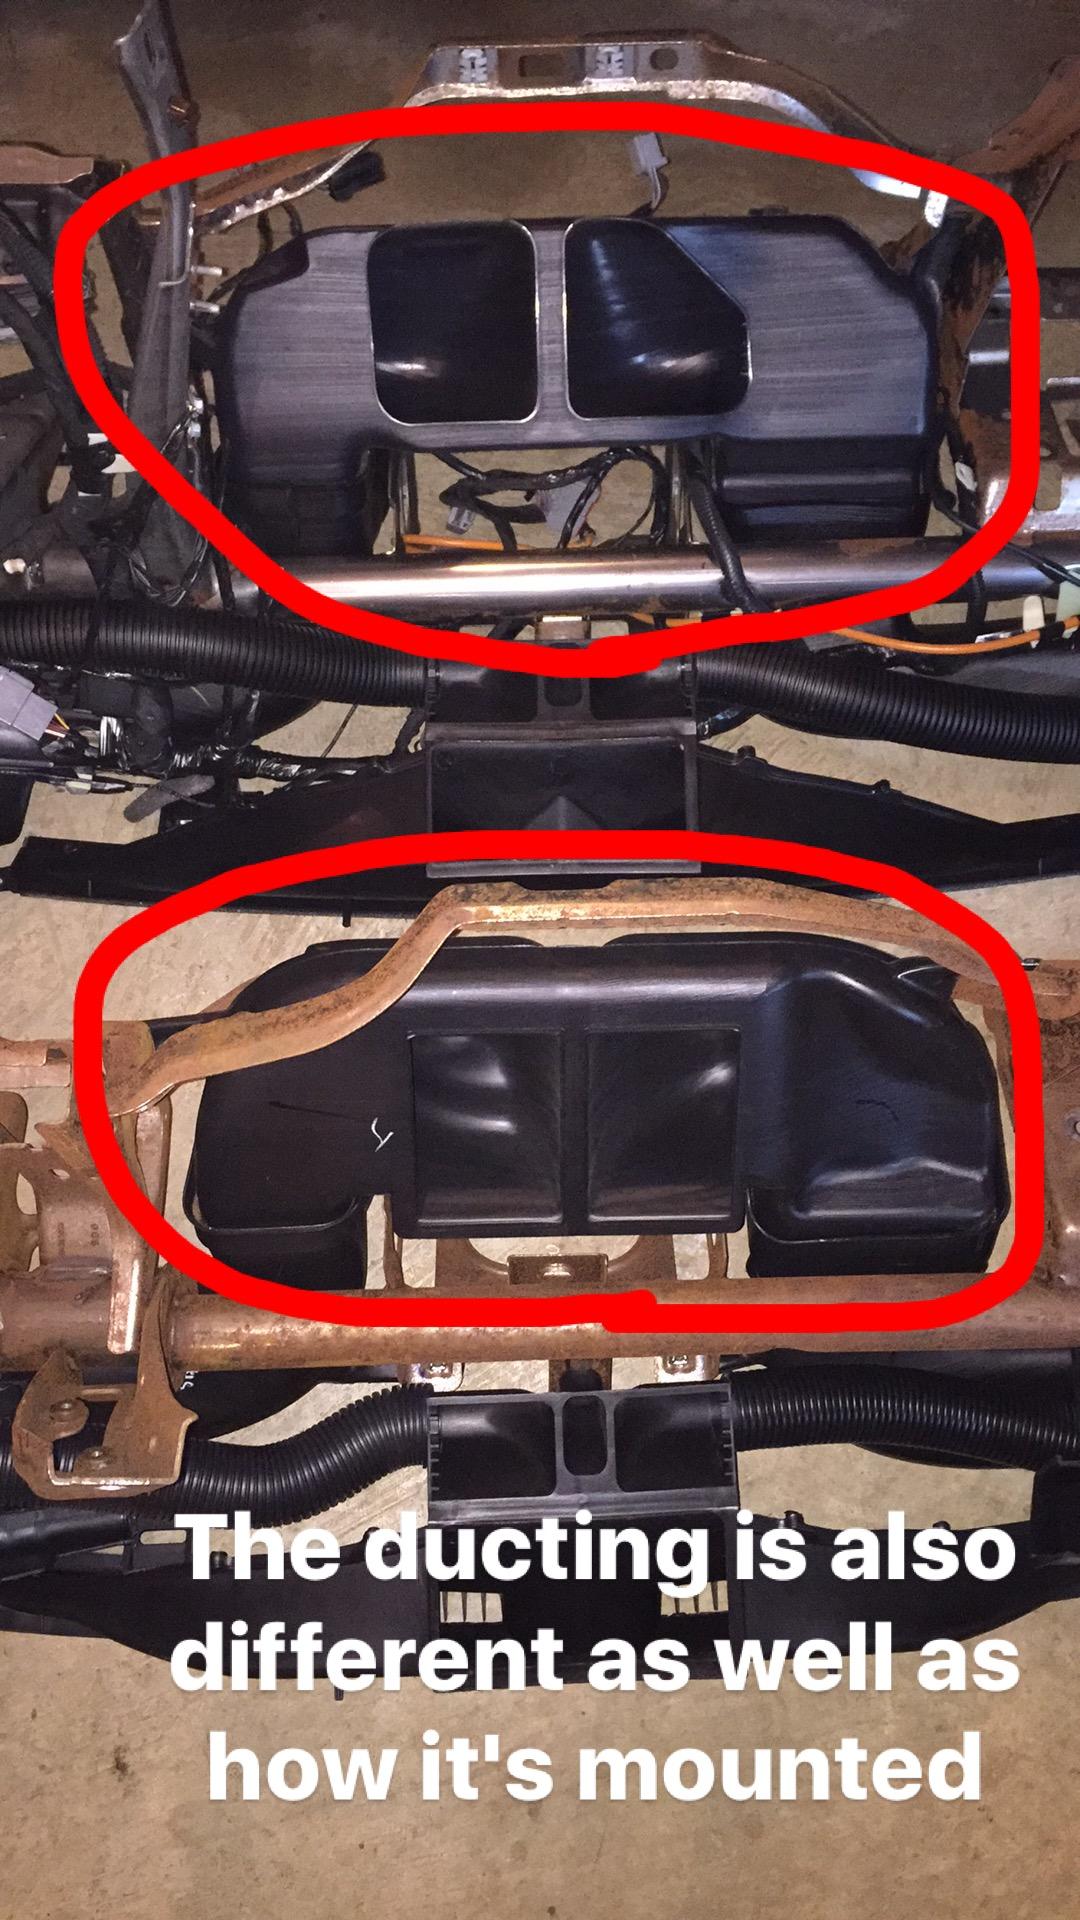 08-16 Dash swap in my E99 7 3 - Ford Powerstroke Diesel Forum